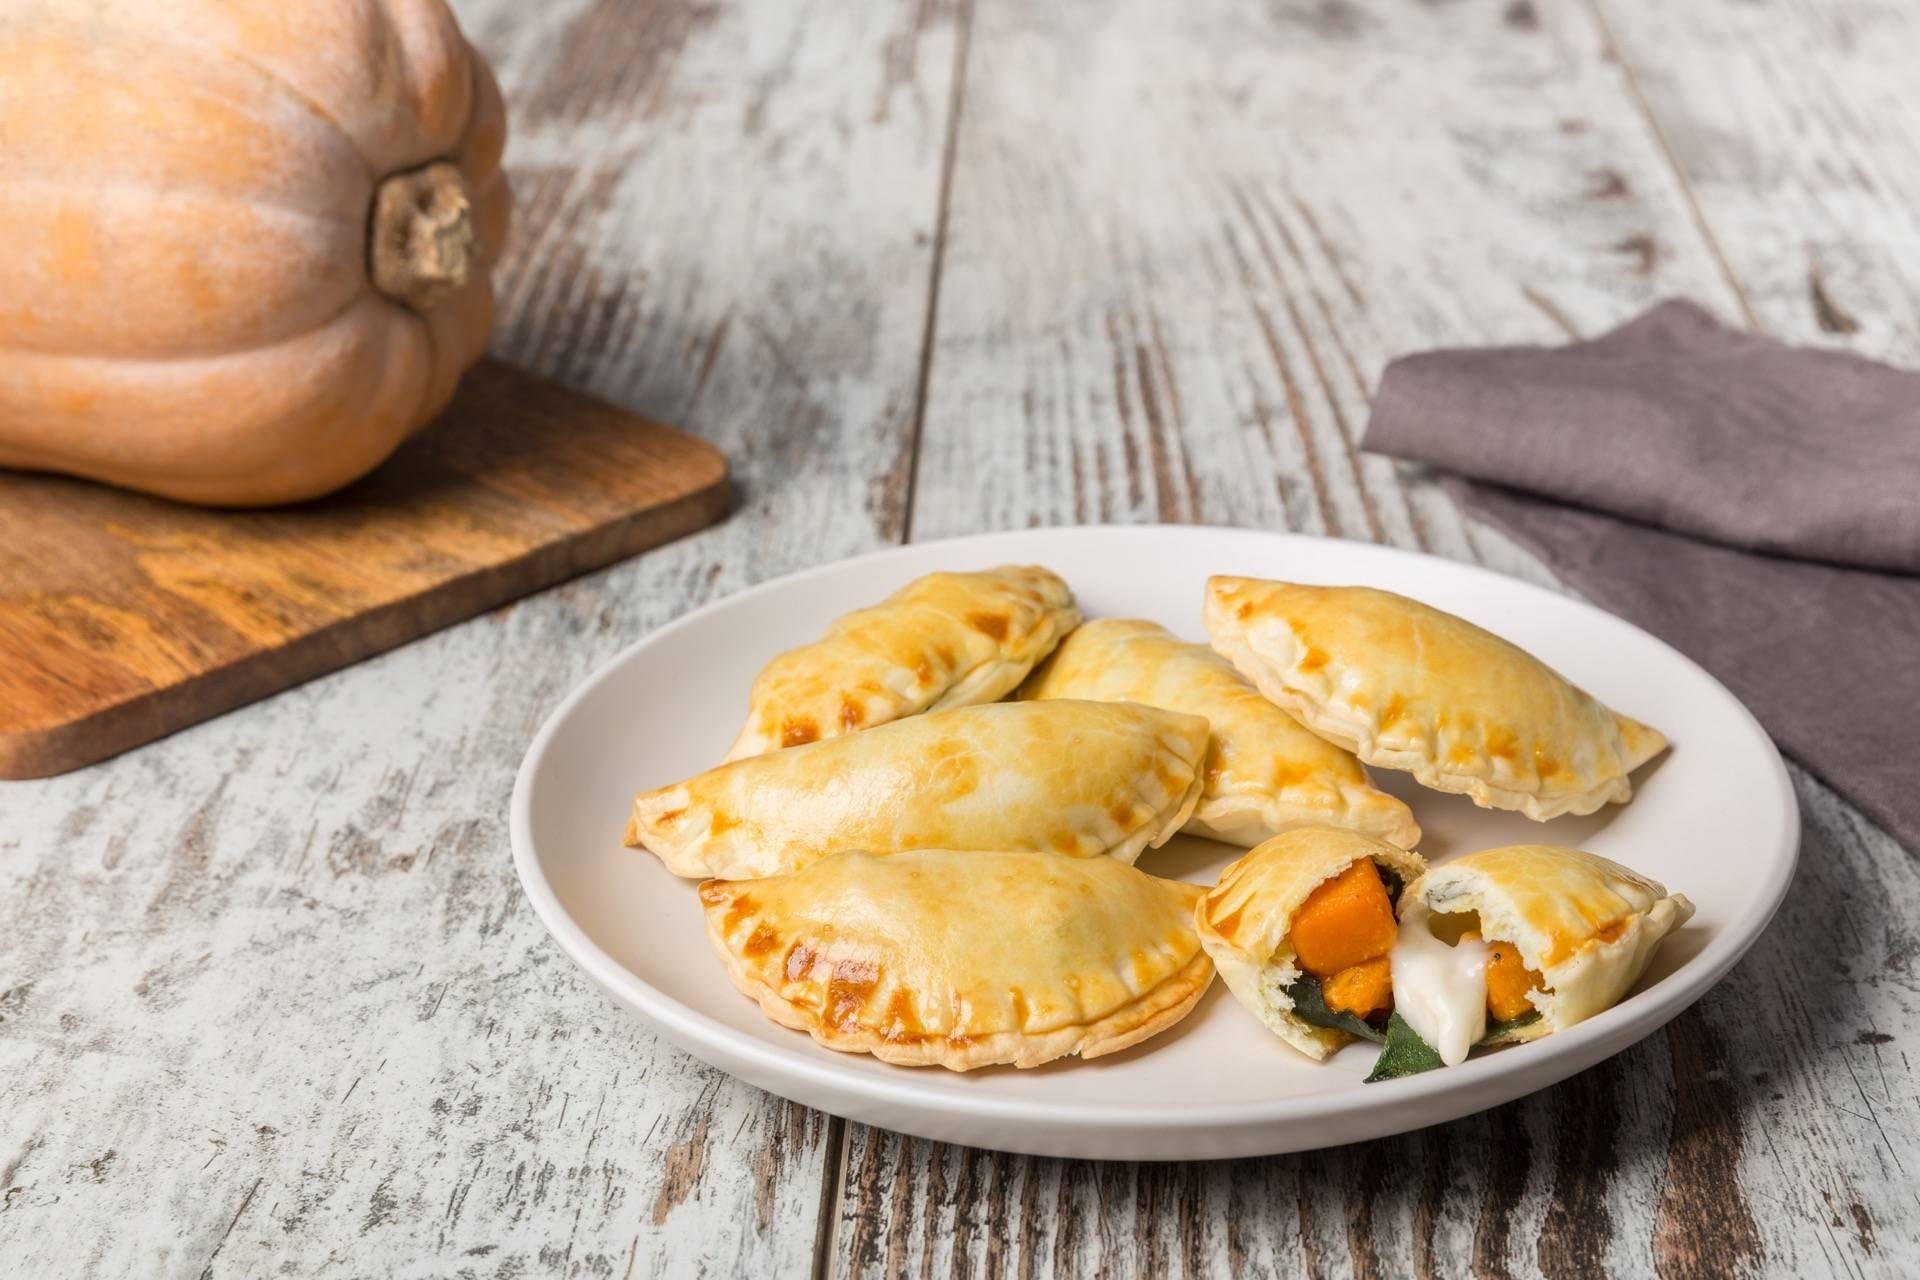 Fagottini al forno - Parmalat